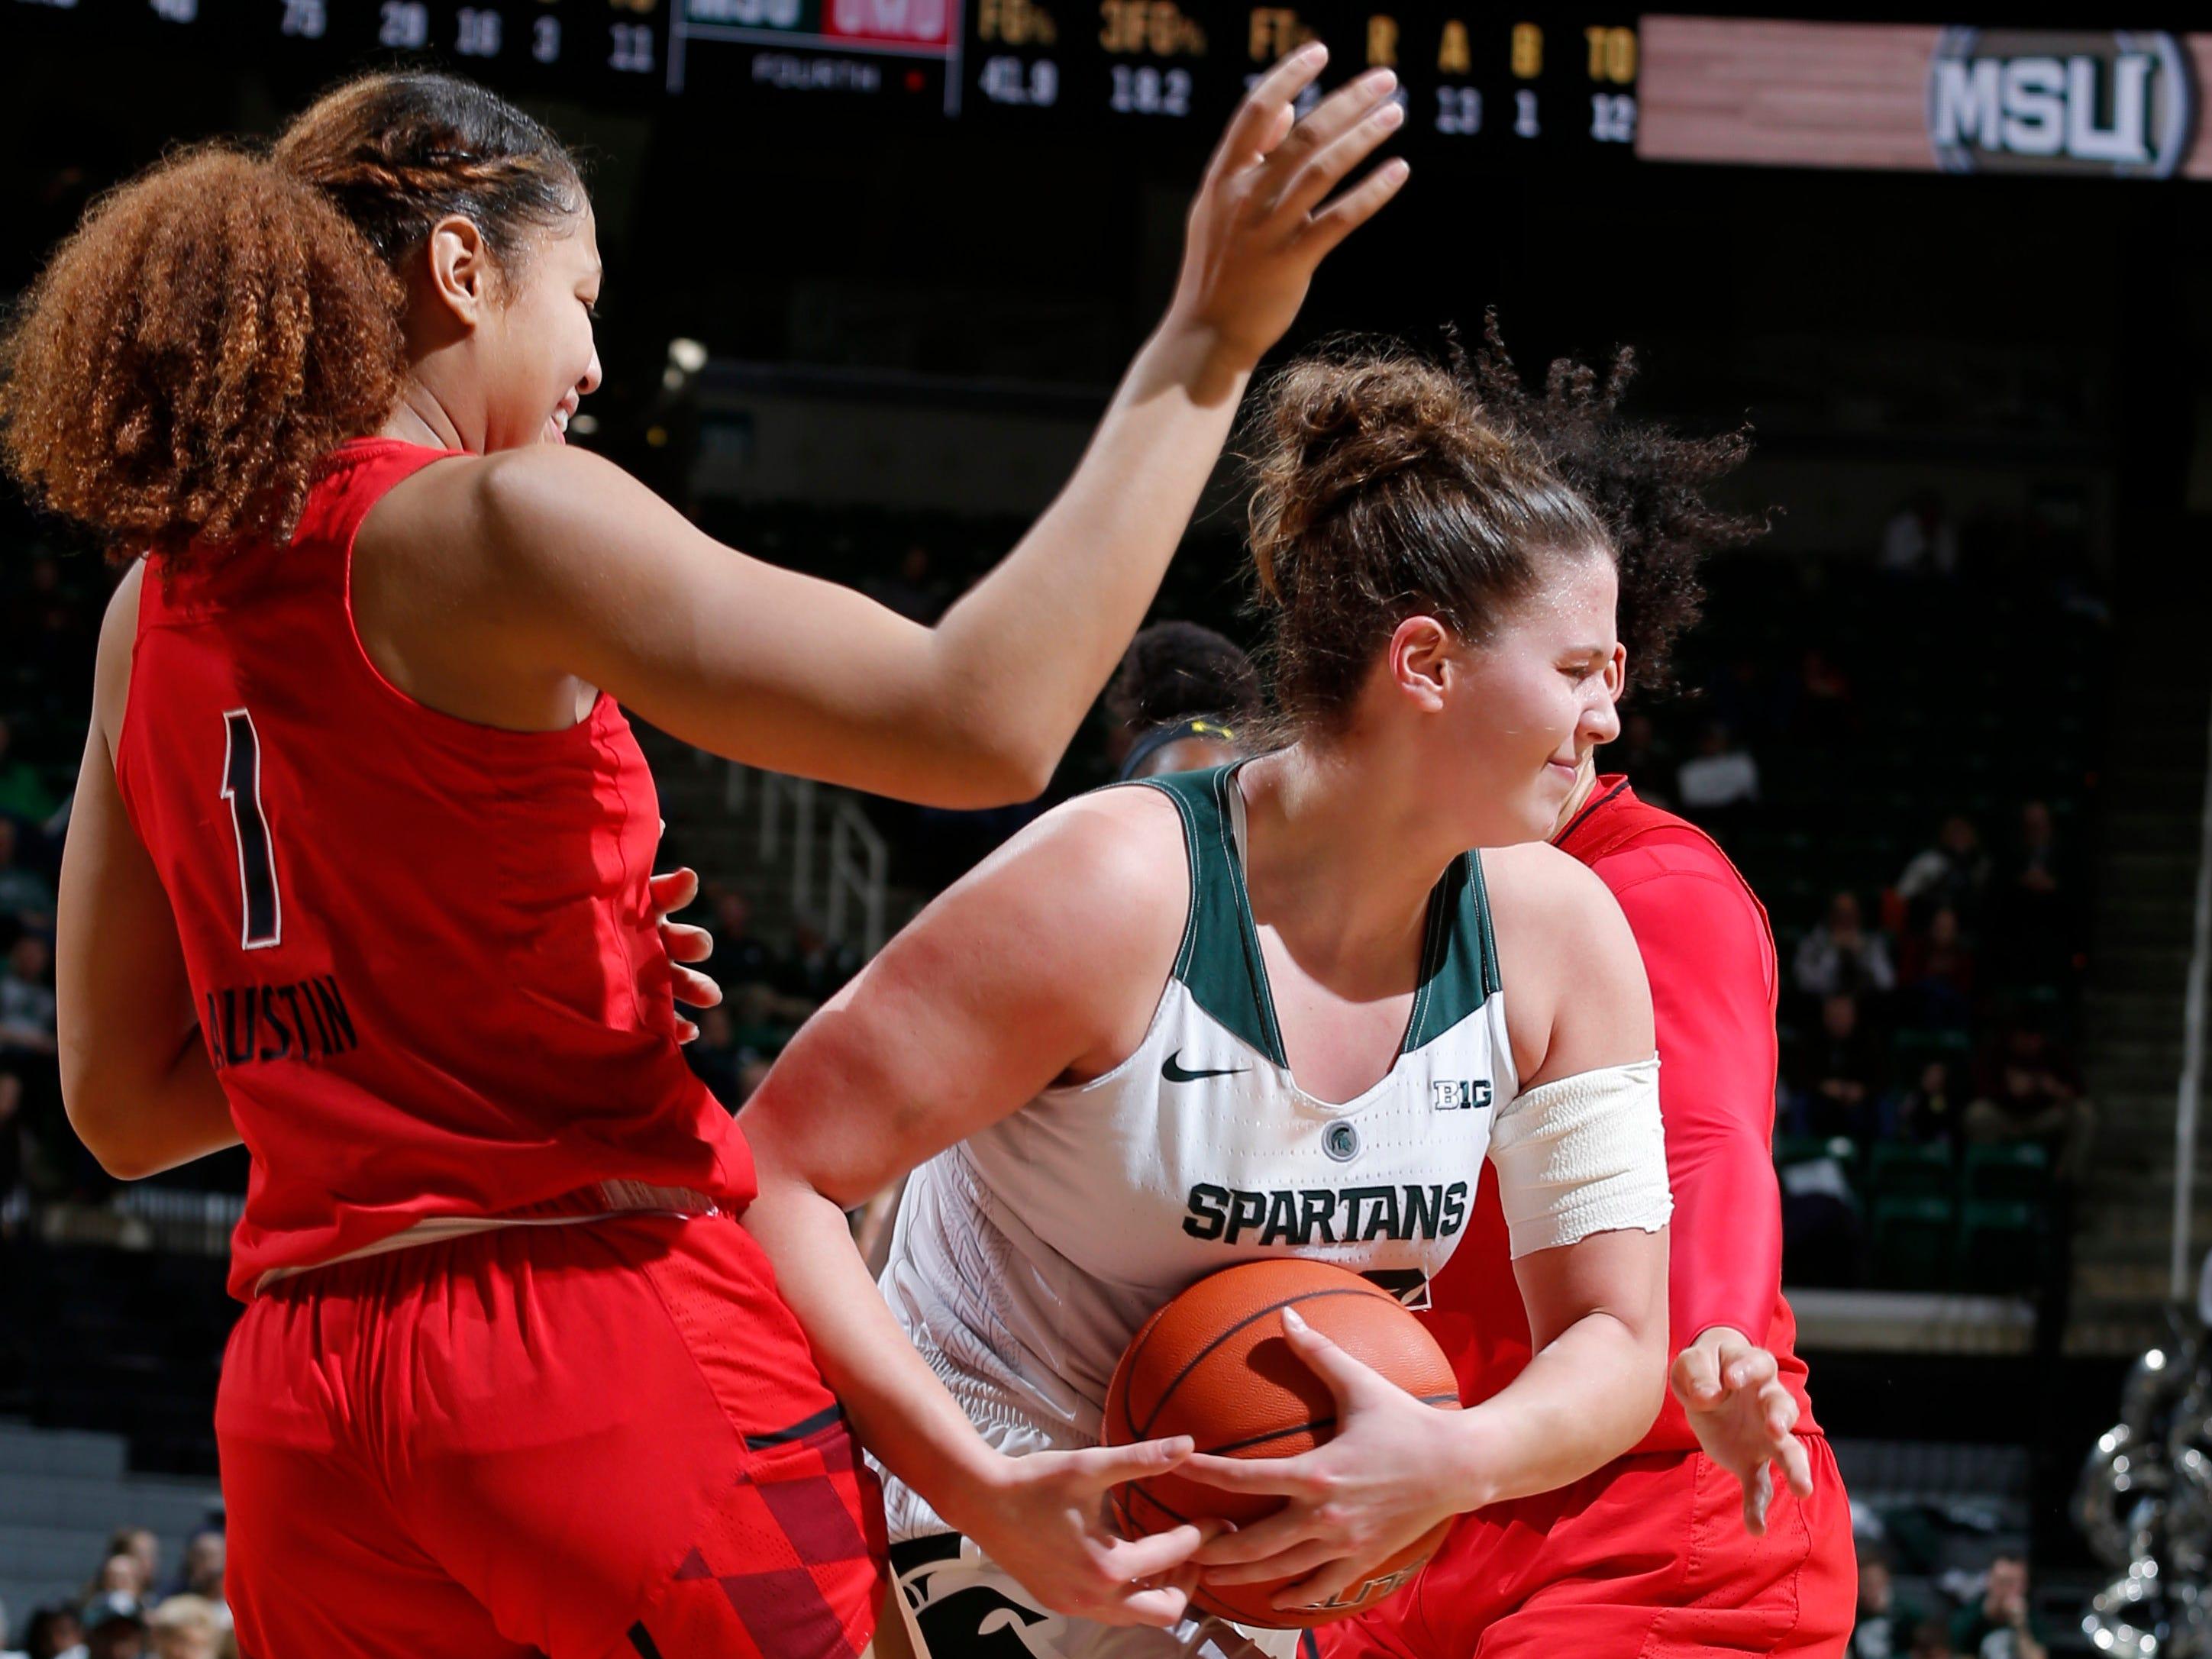 Michigan State's Jenna Allen, center, controls a rebound against Maryland's Shakira Austin, left, Thursday, Jan. 17, 2019, in East Lansing, Mich.